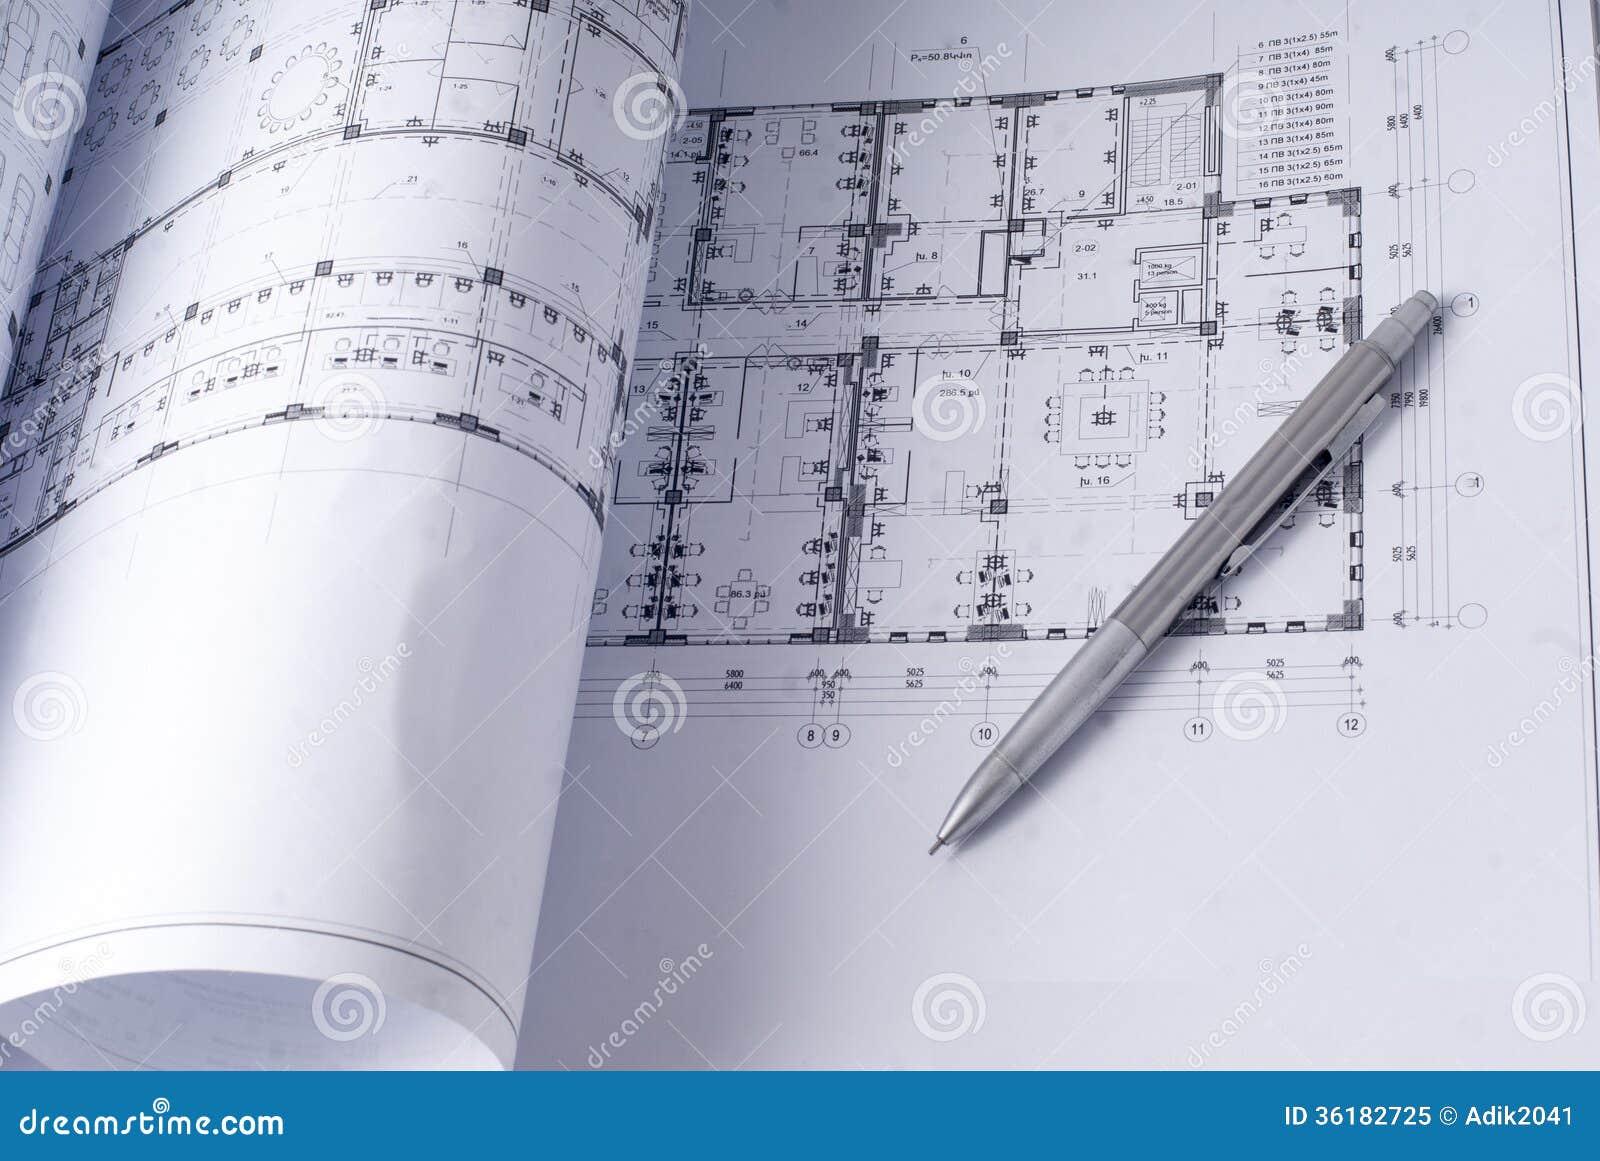 Architecture business plan